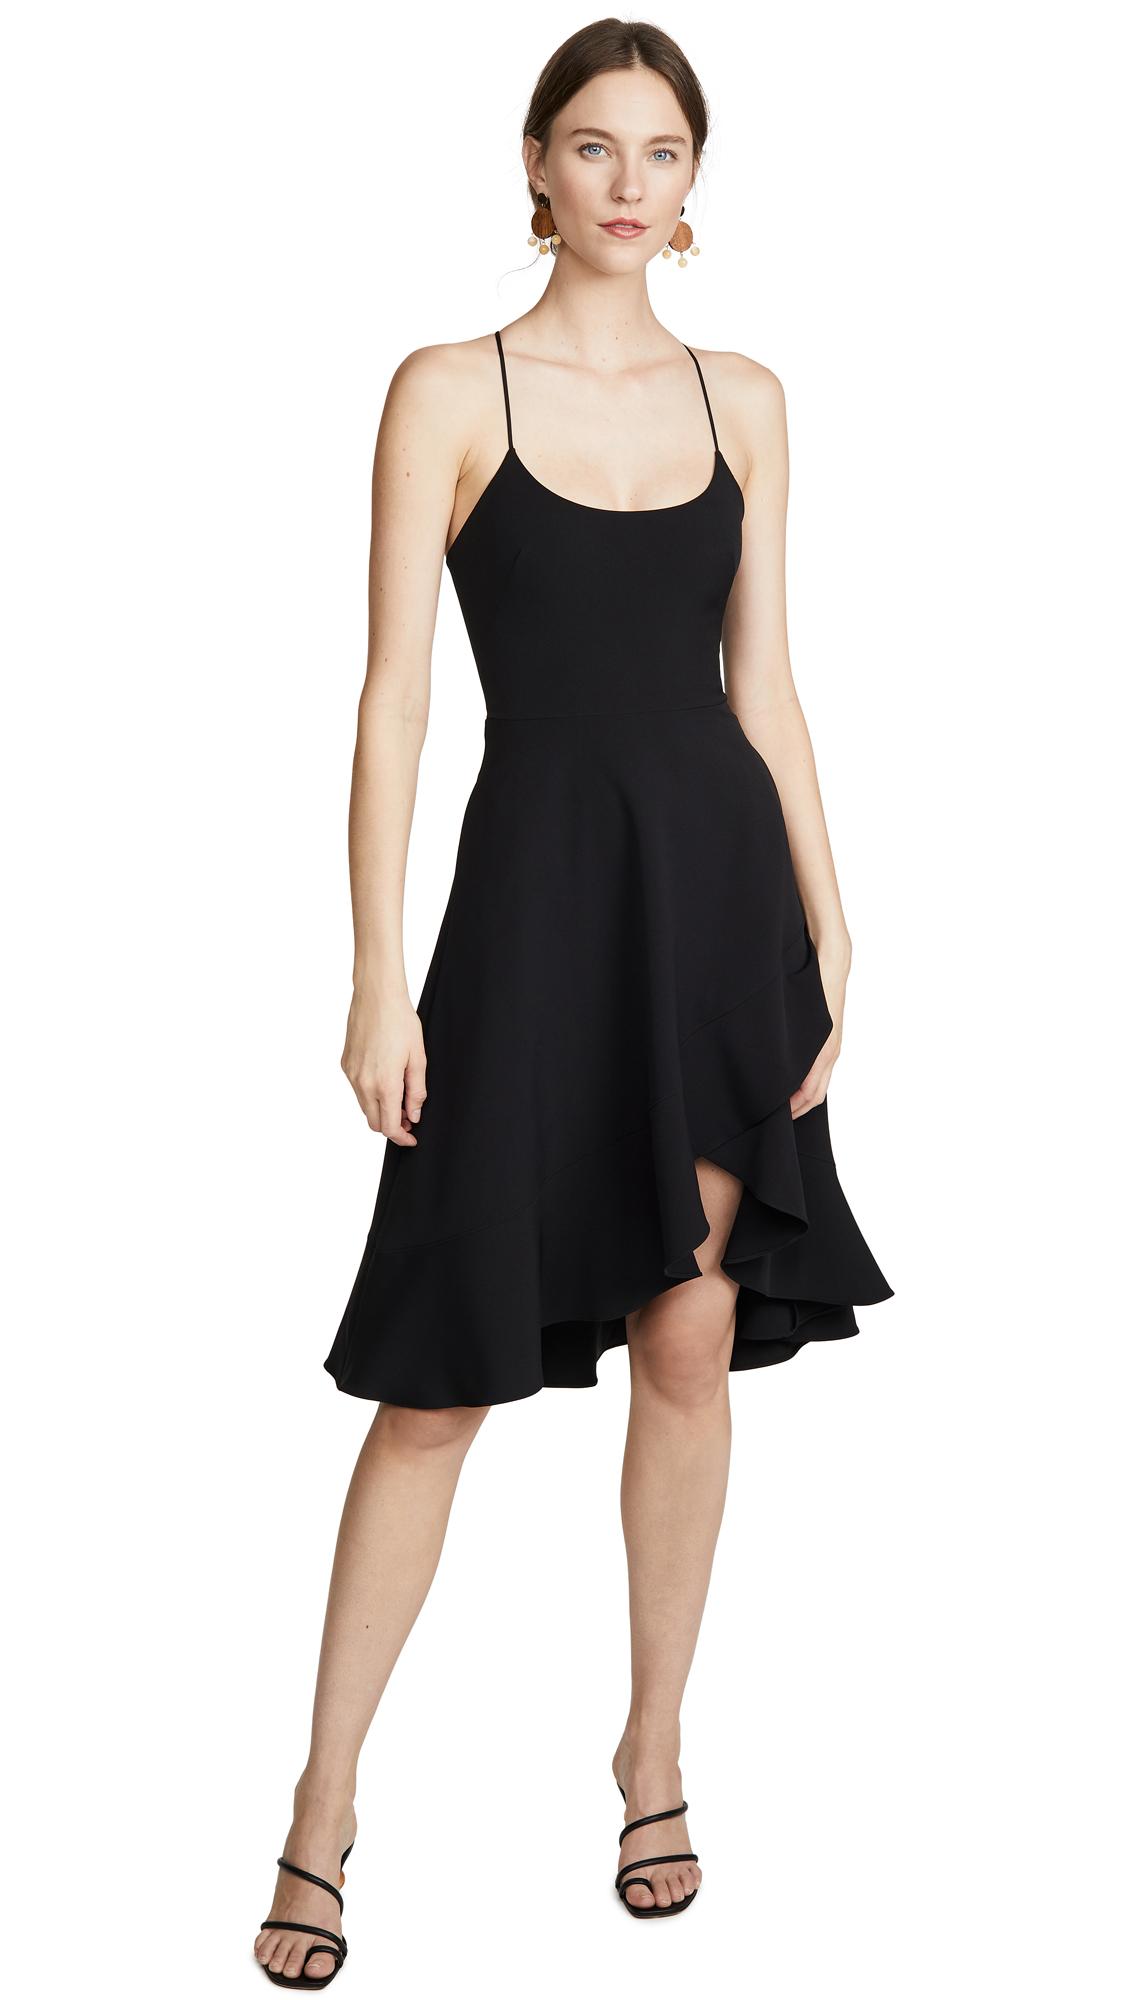 Black Halo Marie Dress - 50% Off Sale